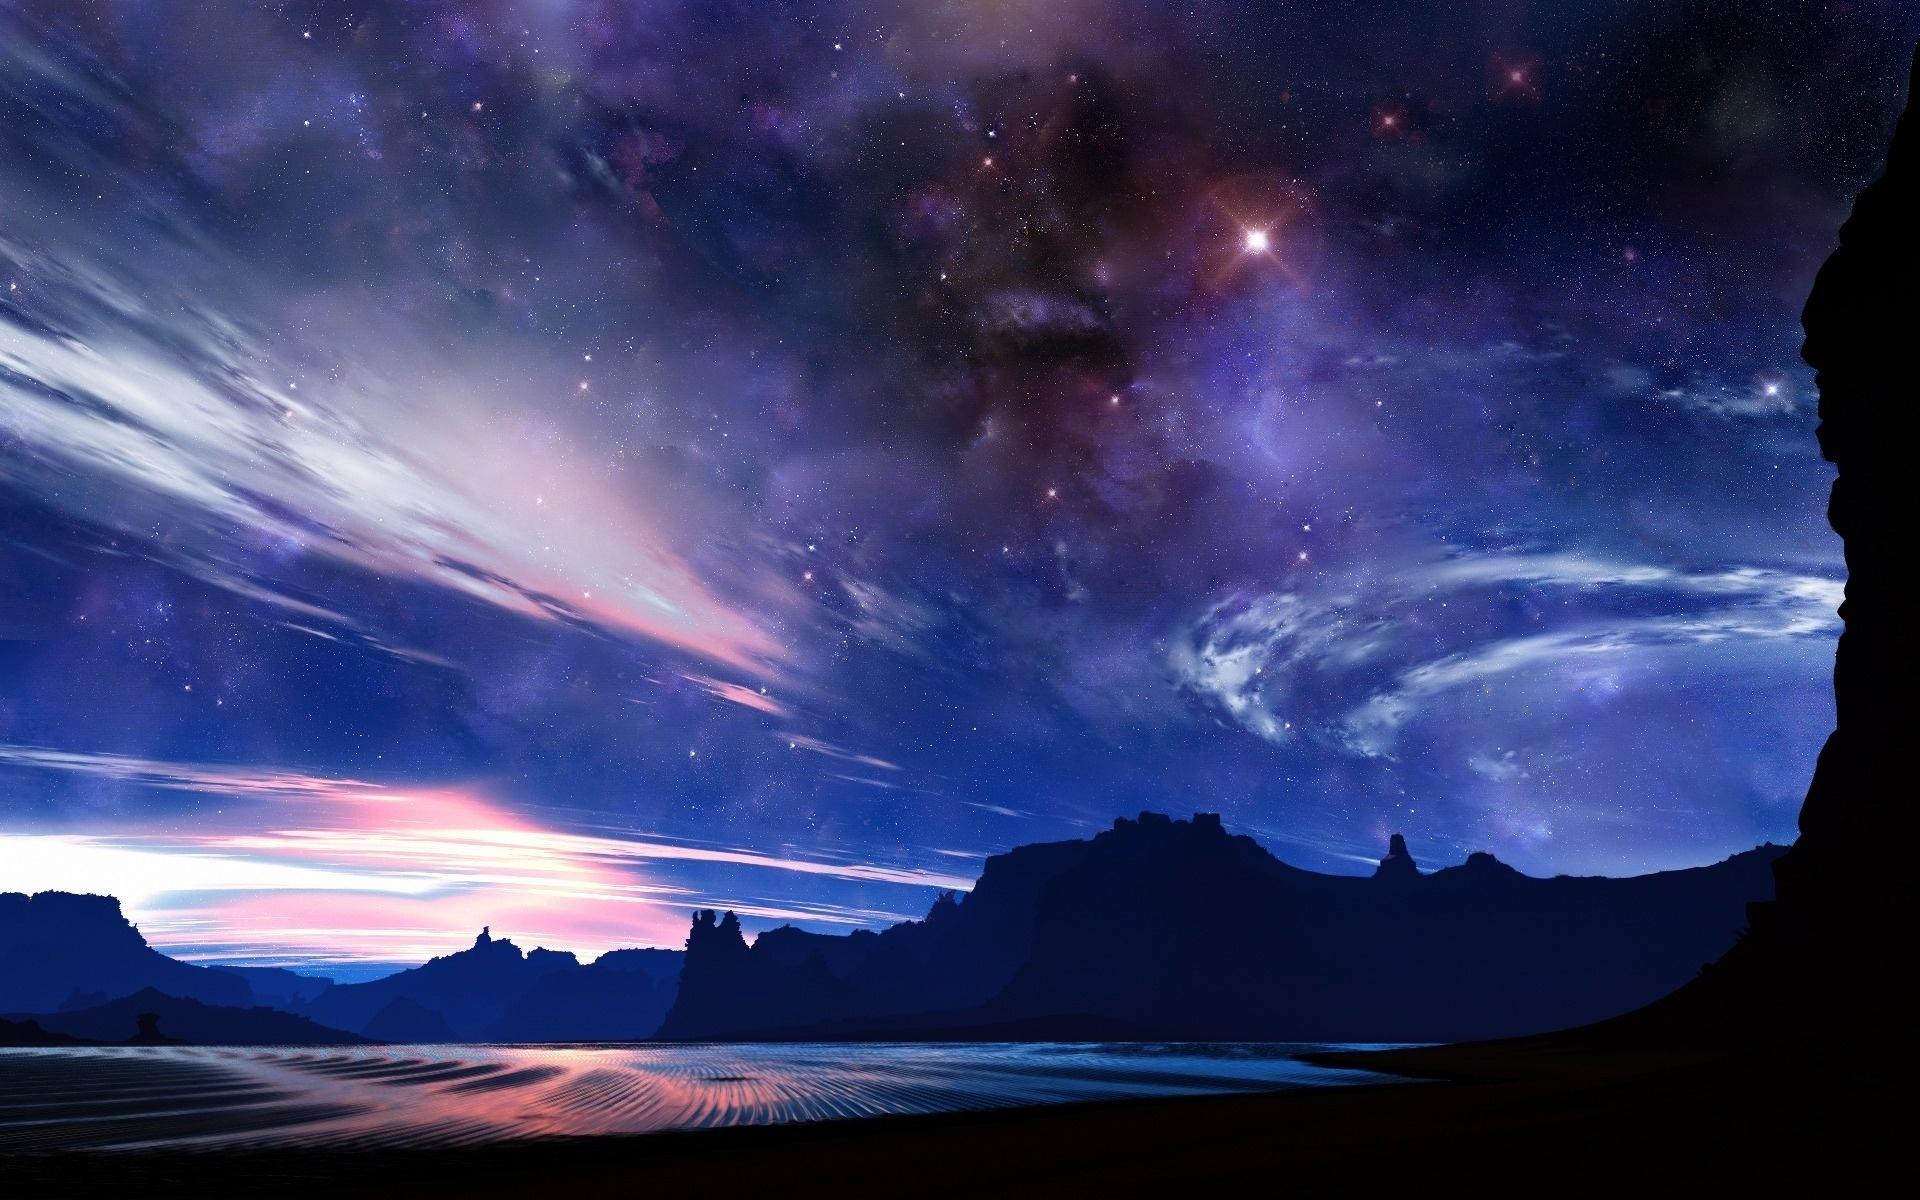 Stars Night Sky Wallpapers Group